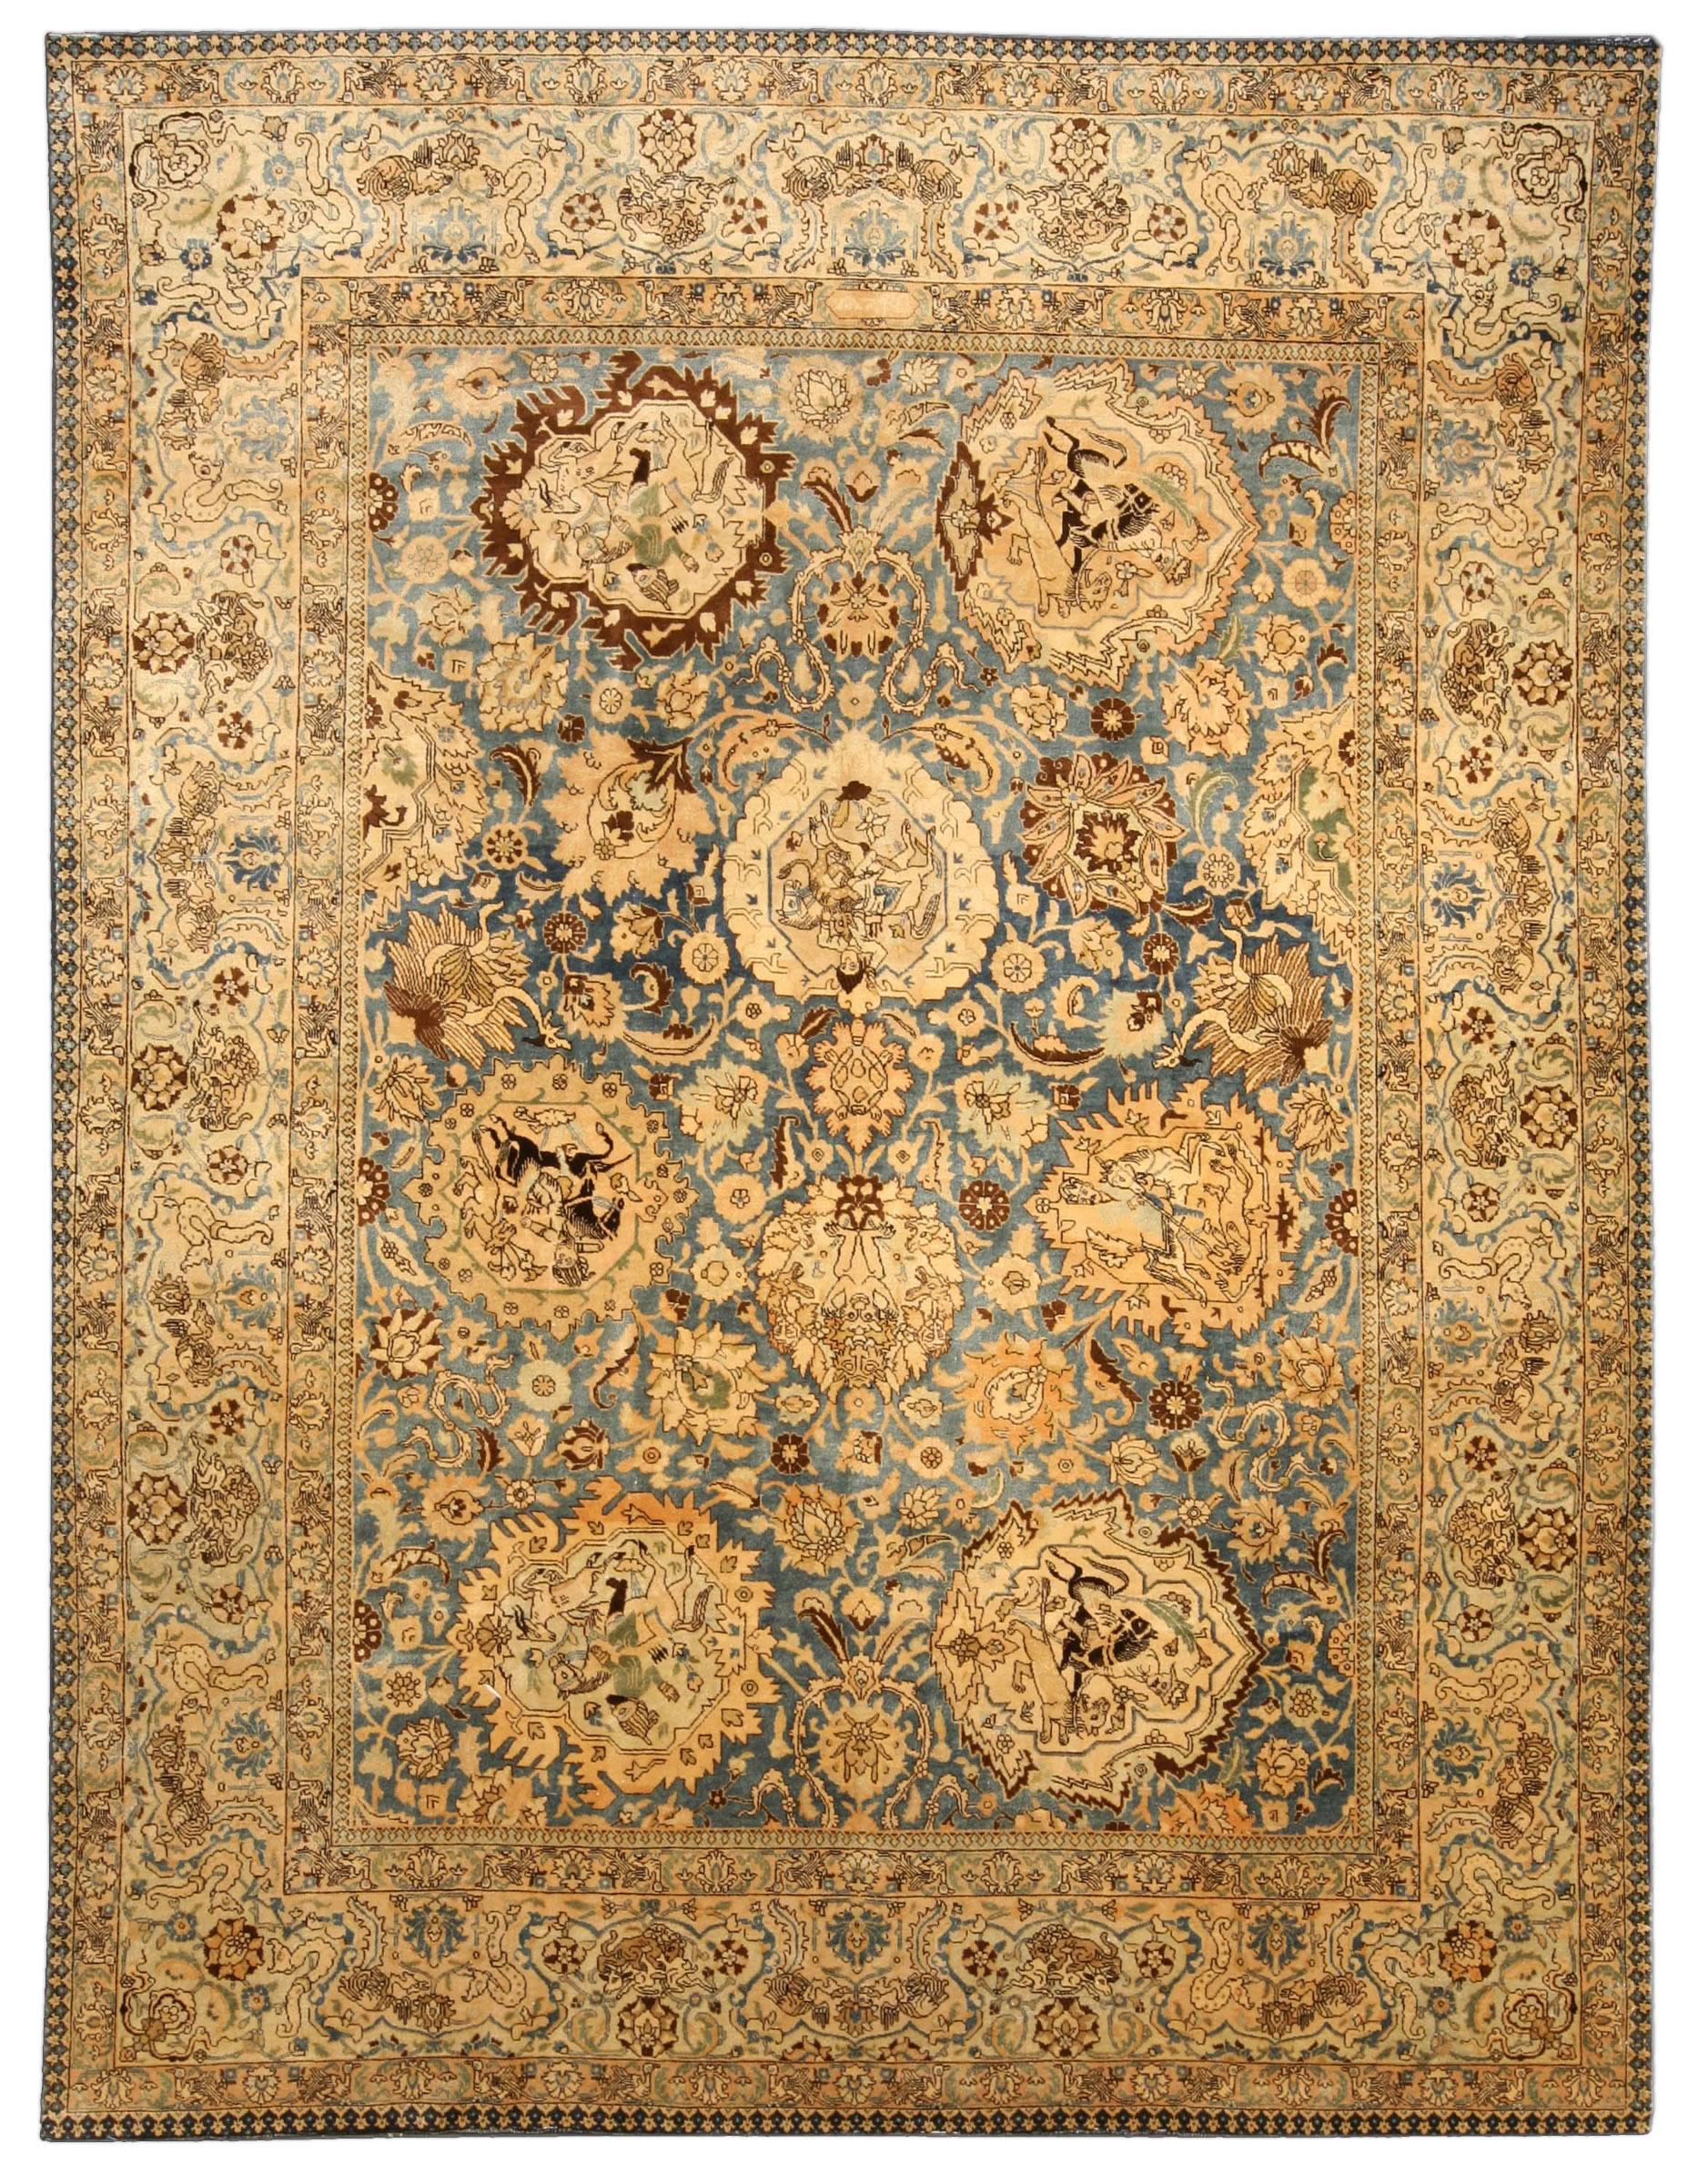 Antique Persian Tabriz Rug BB4034